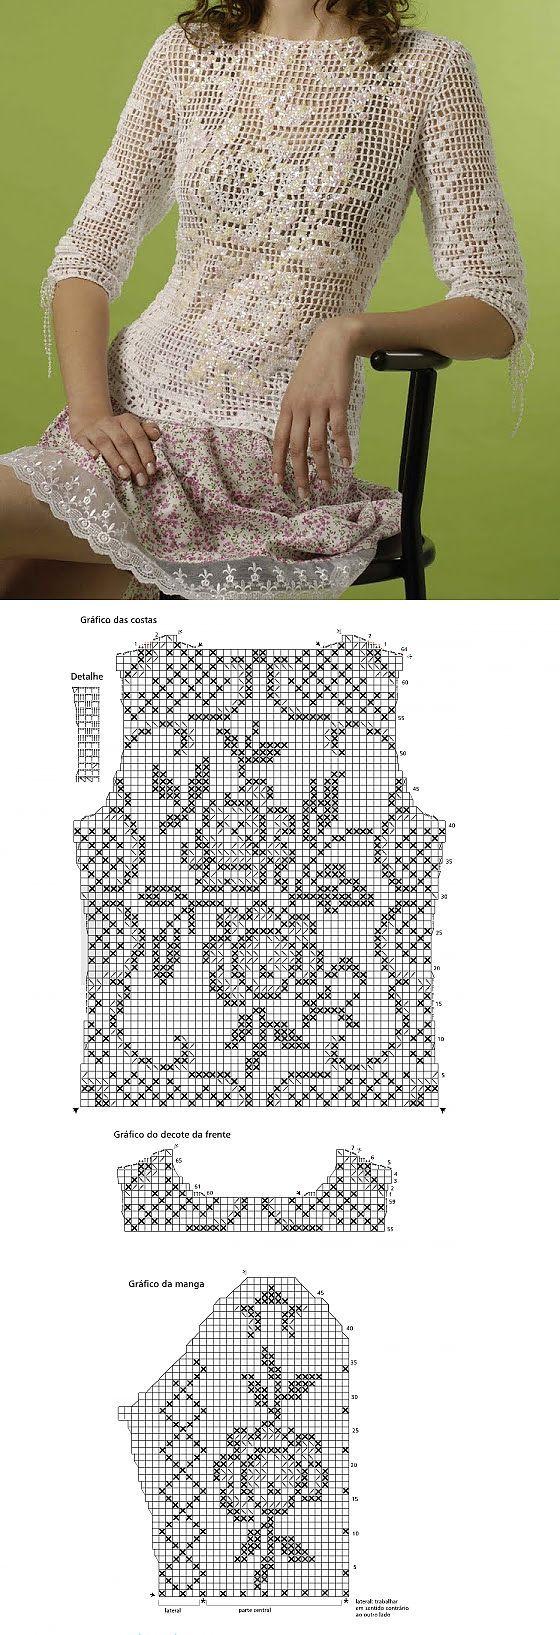 Weiße Rose - Filethäkelei ---- white rose ---- Белые розы филе. | филейное вязание | Постила